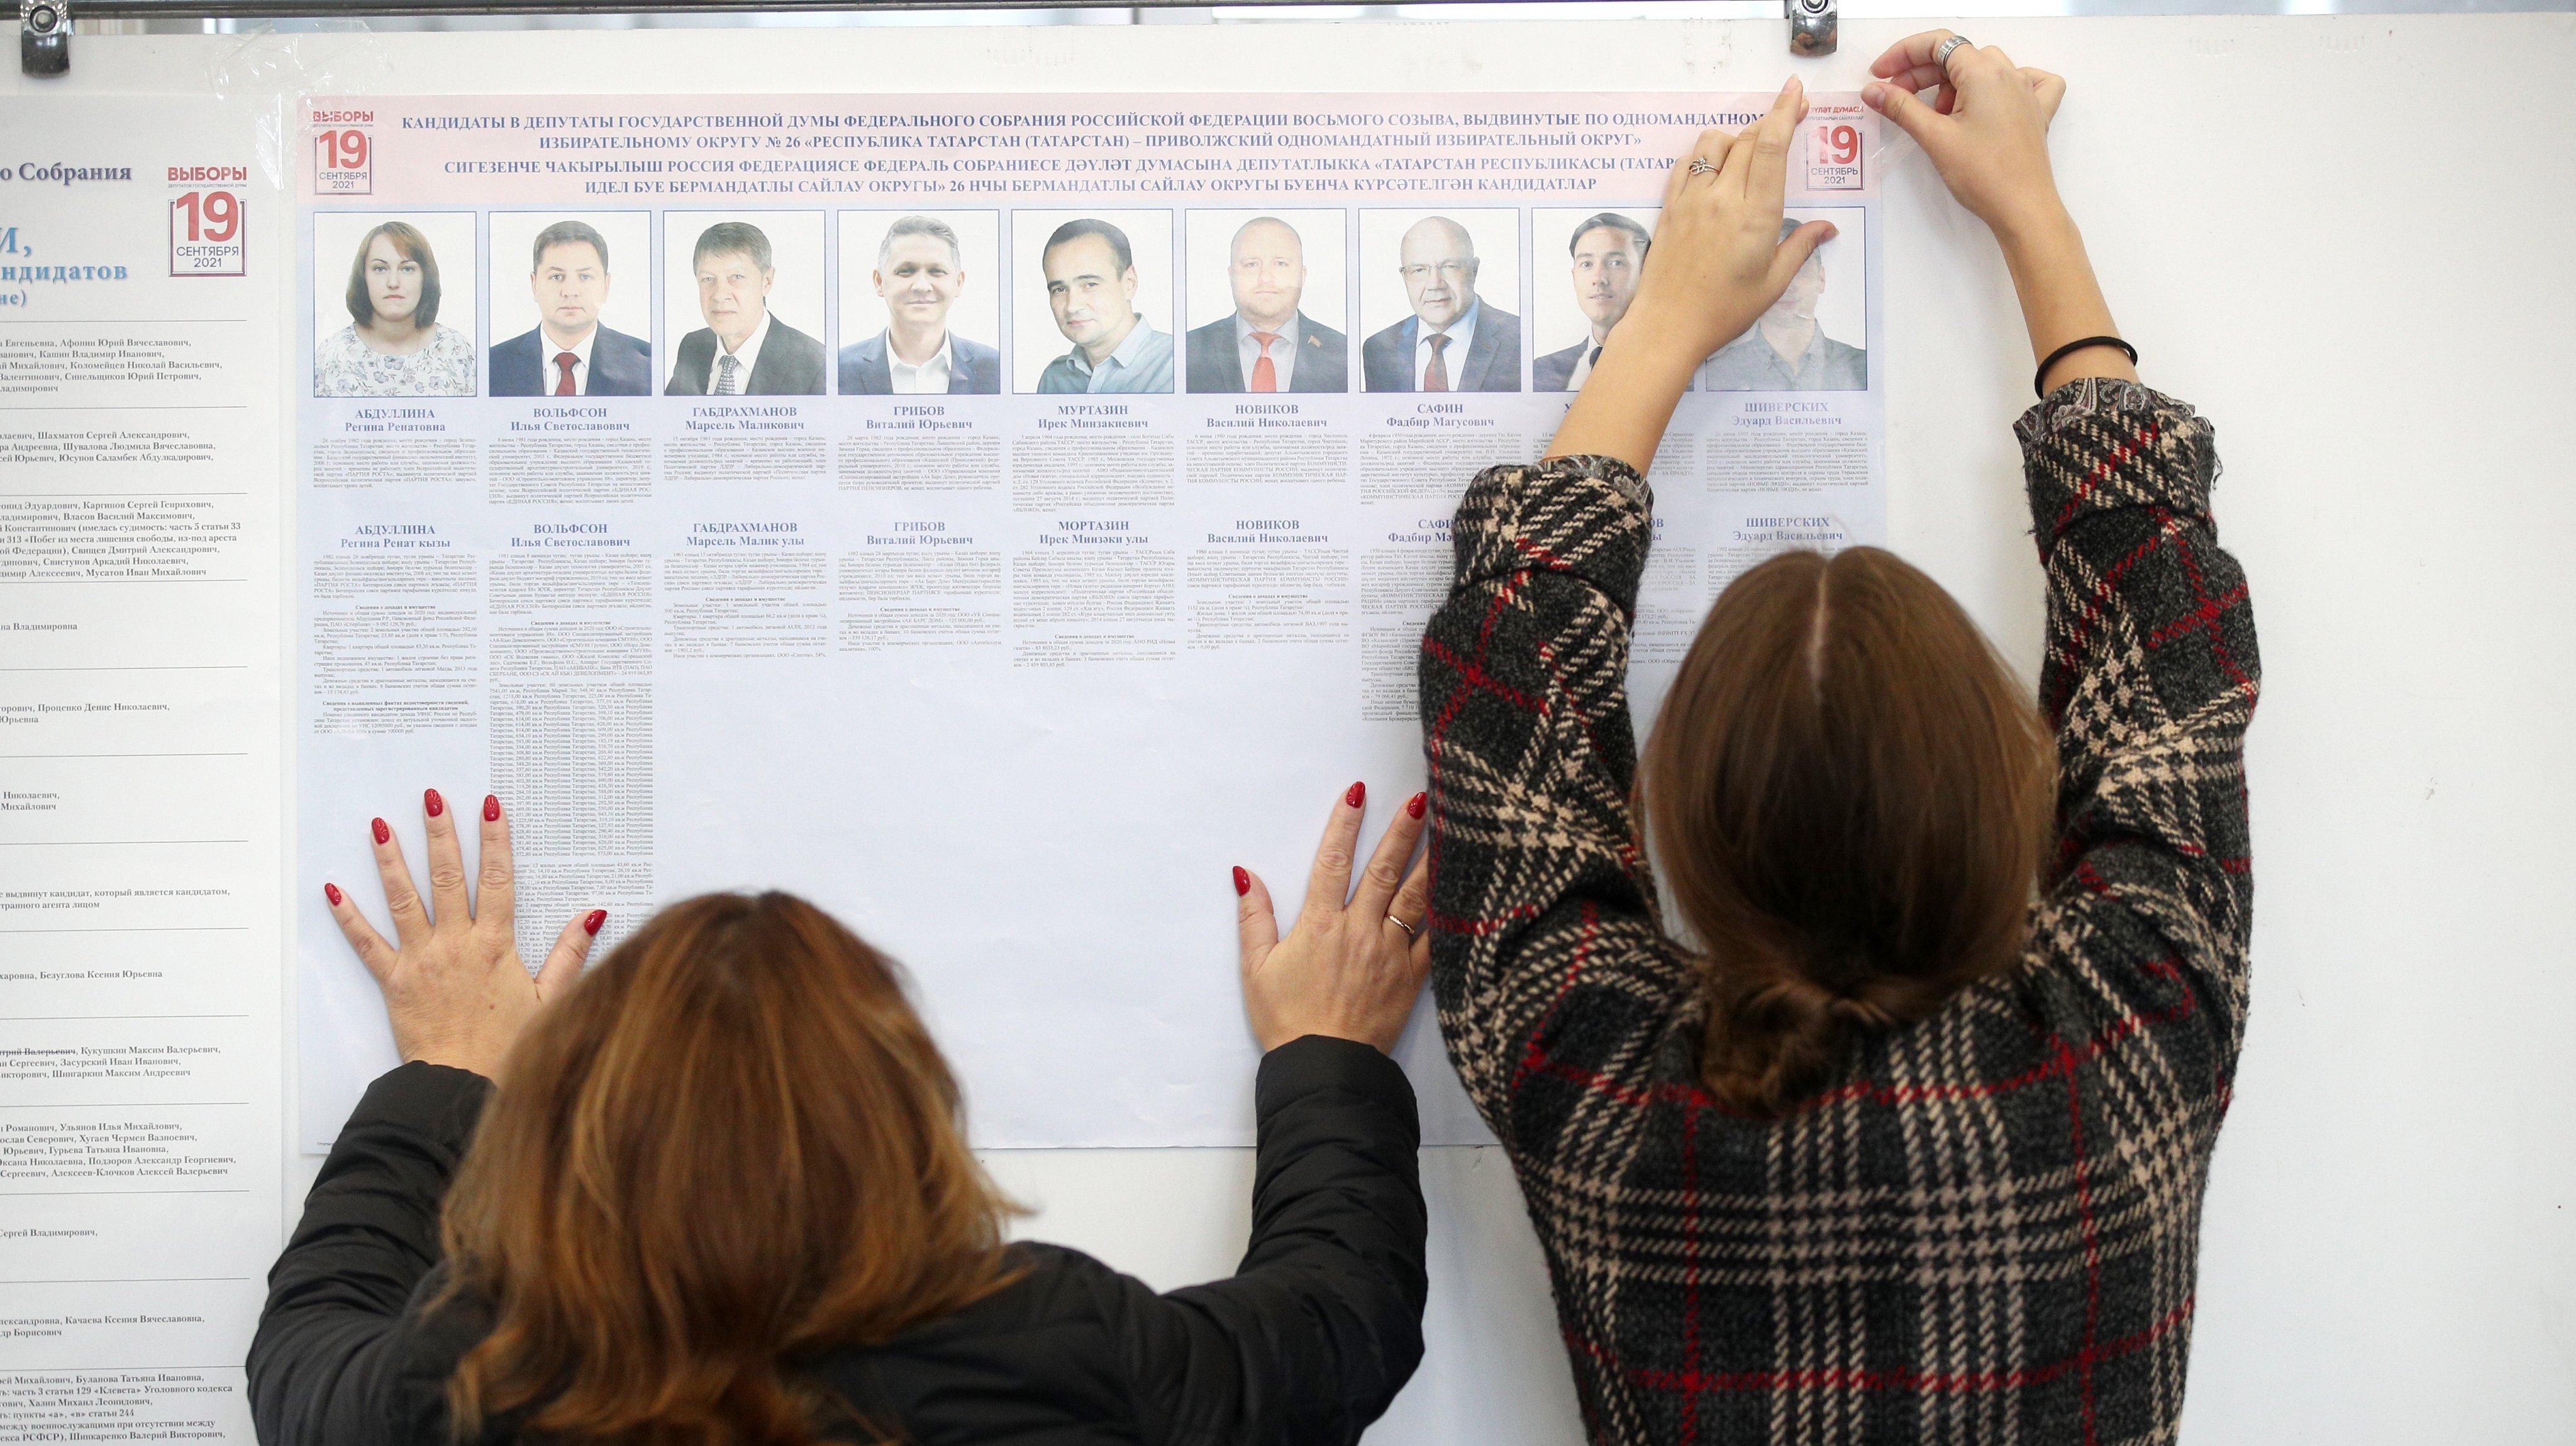 Polling stations ahead of 2021 Russian legislative election in Kazan